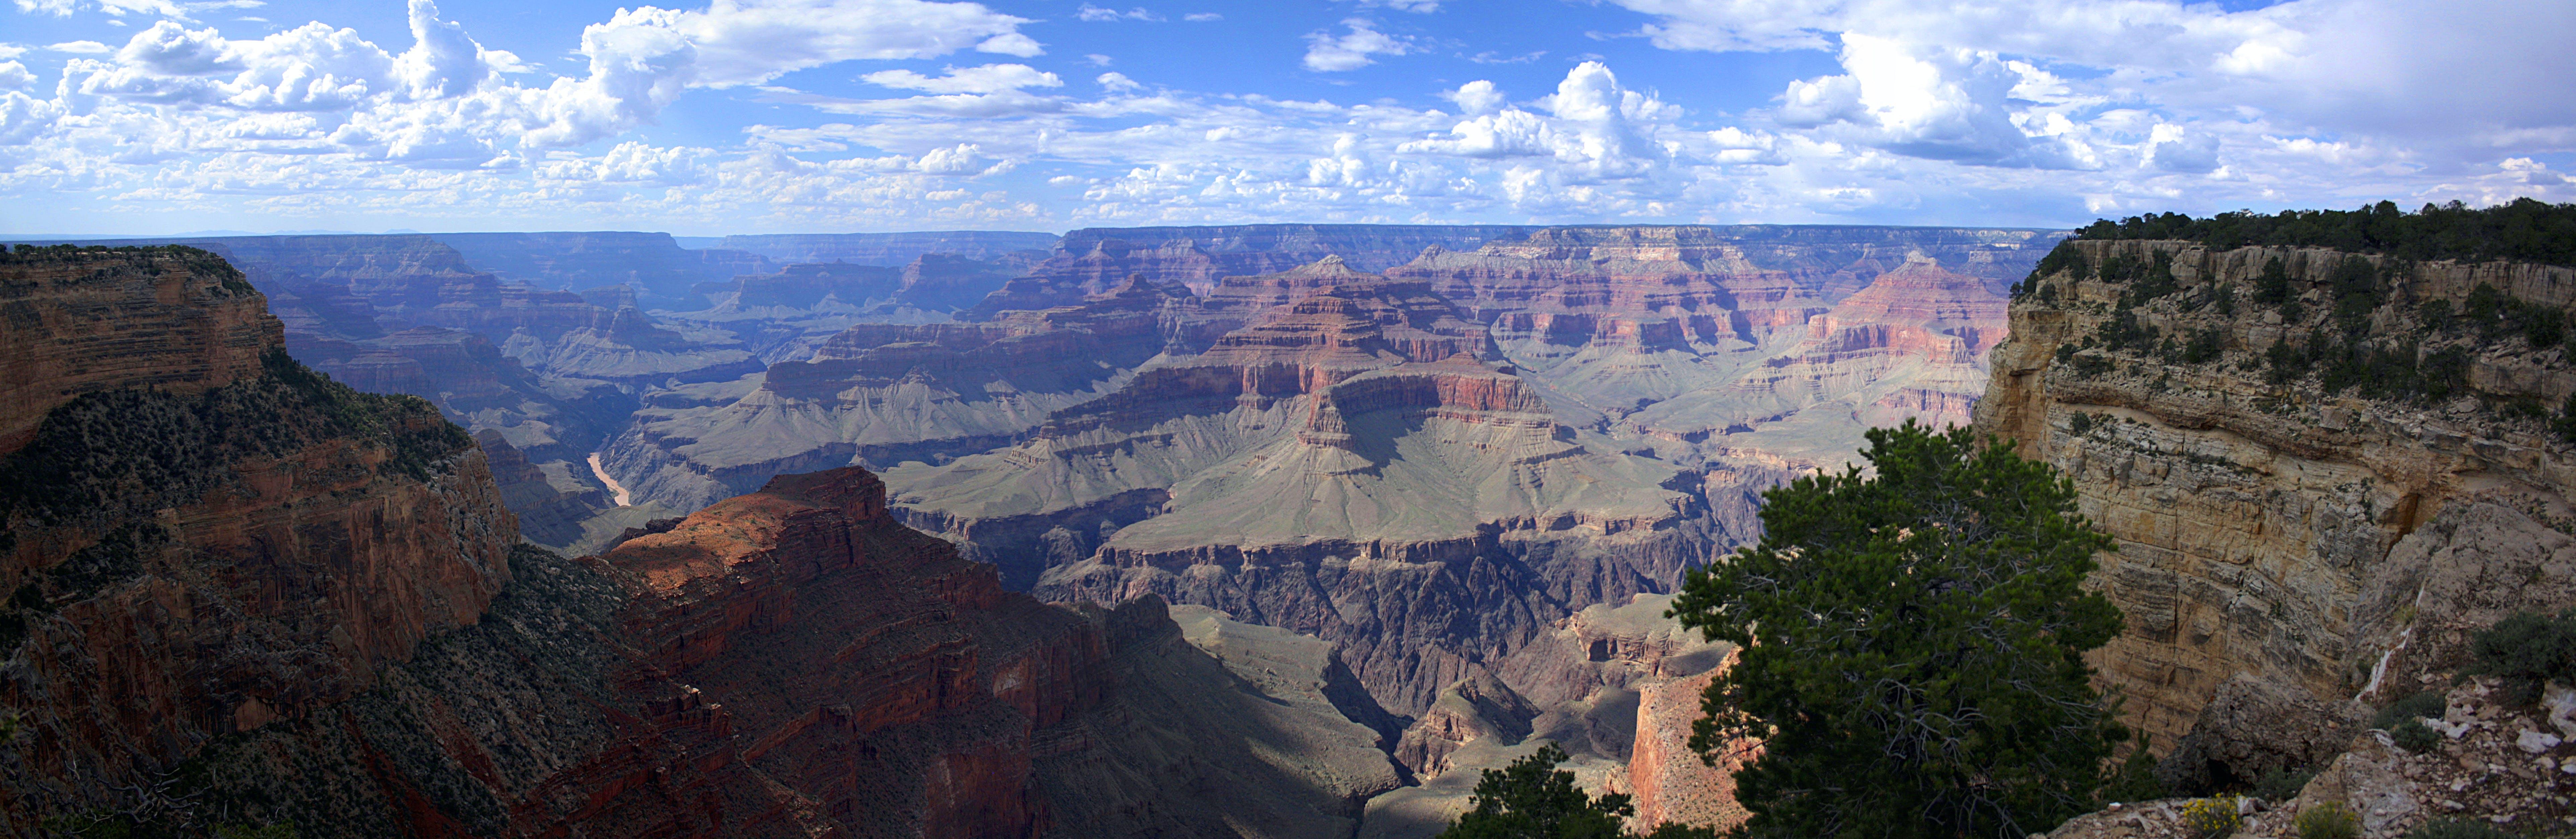 Free stock photo of grand canyon, united states